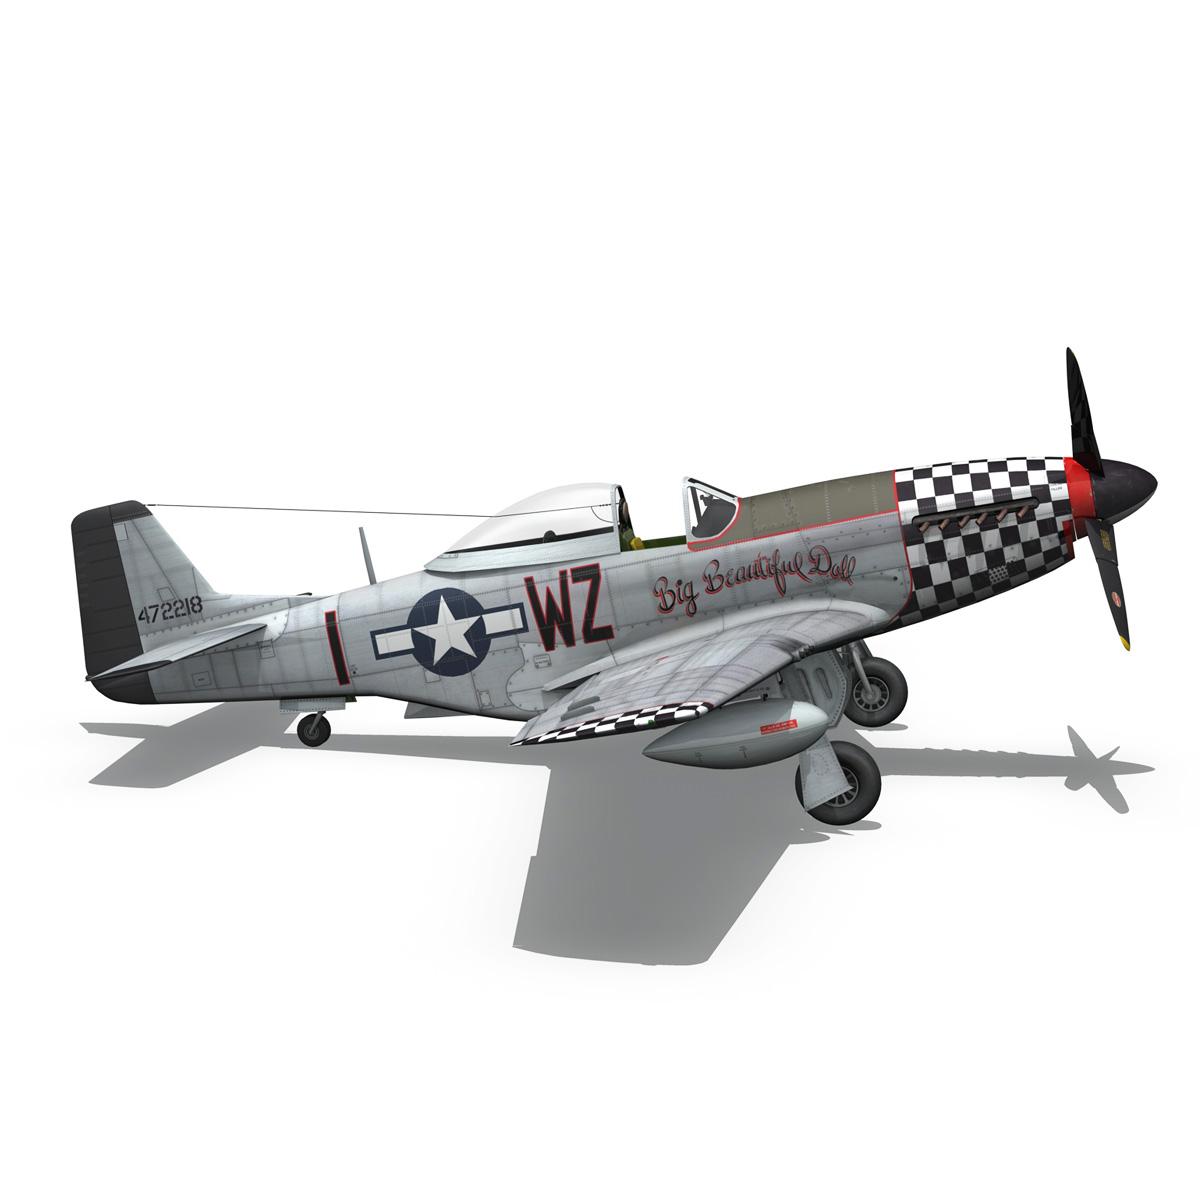 north american p-51d mustang – big beautiful doll 3d model fbx c4d lwo obj 282565